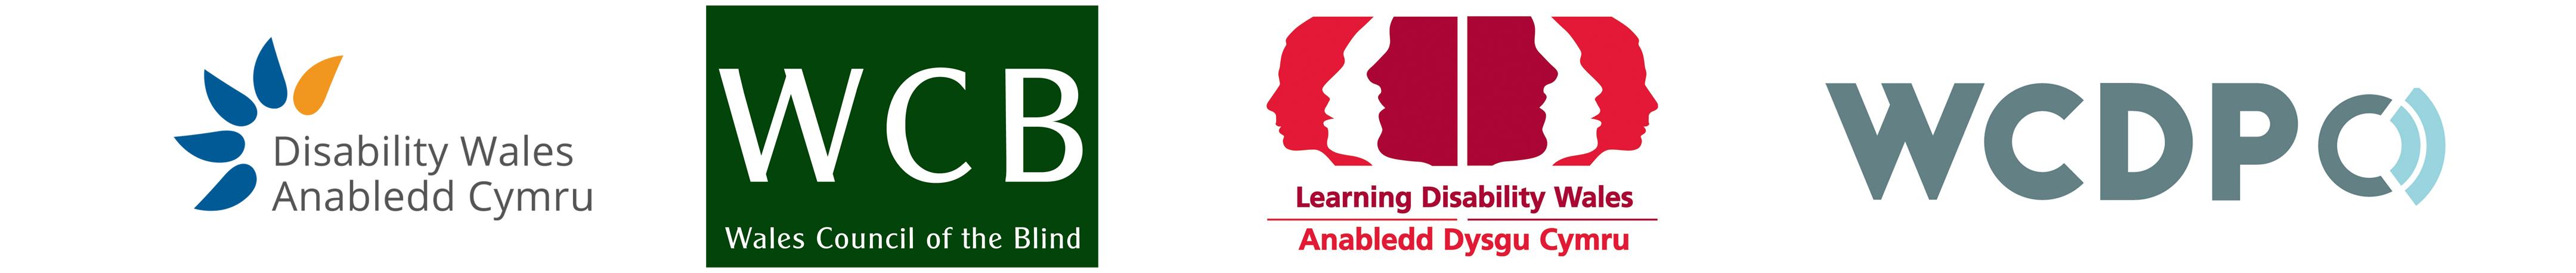 welsh national disability organisation logos